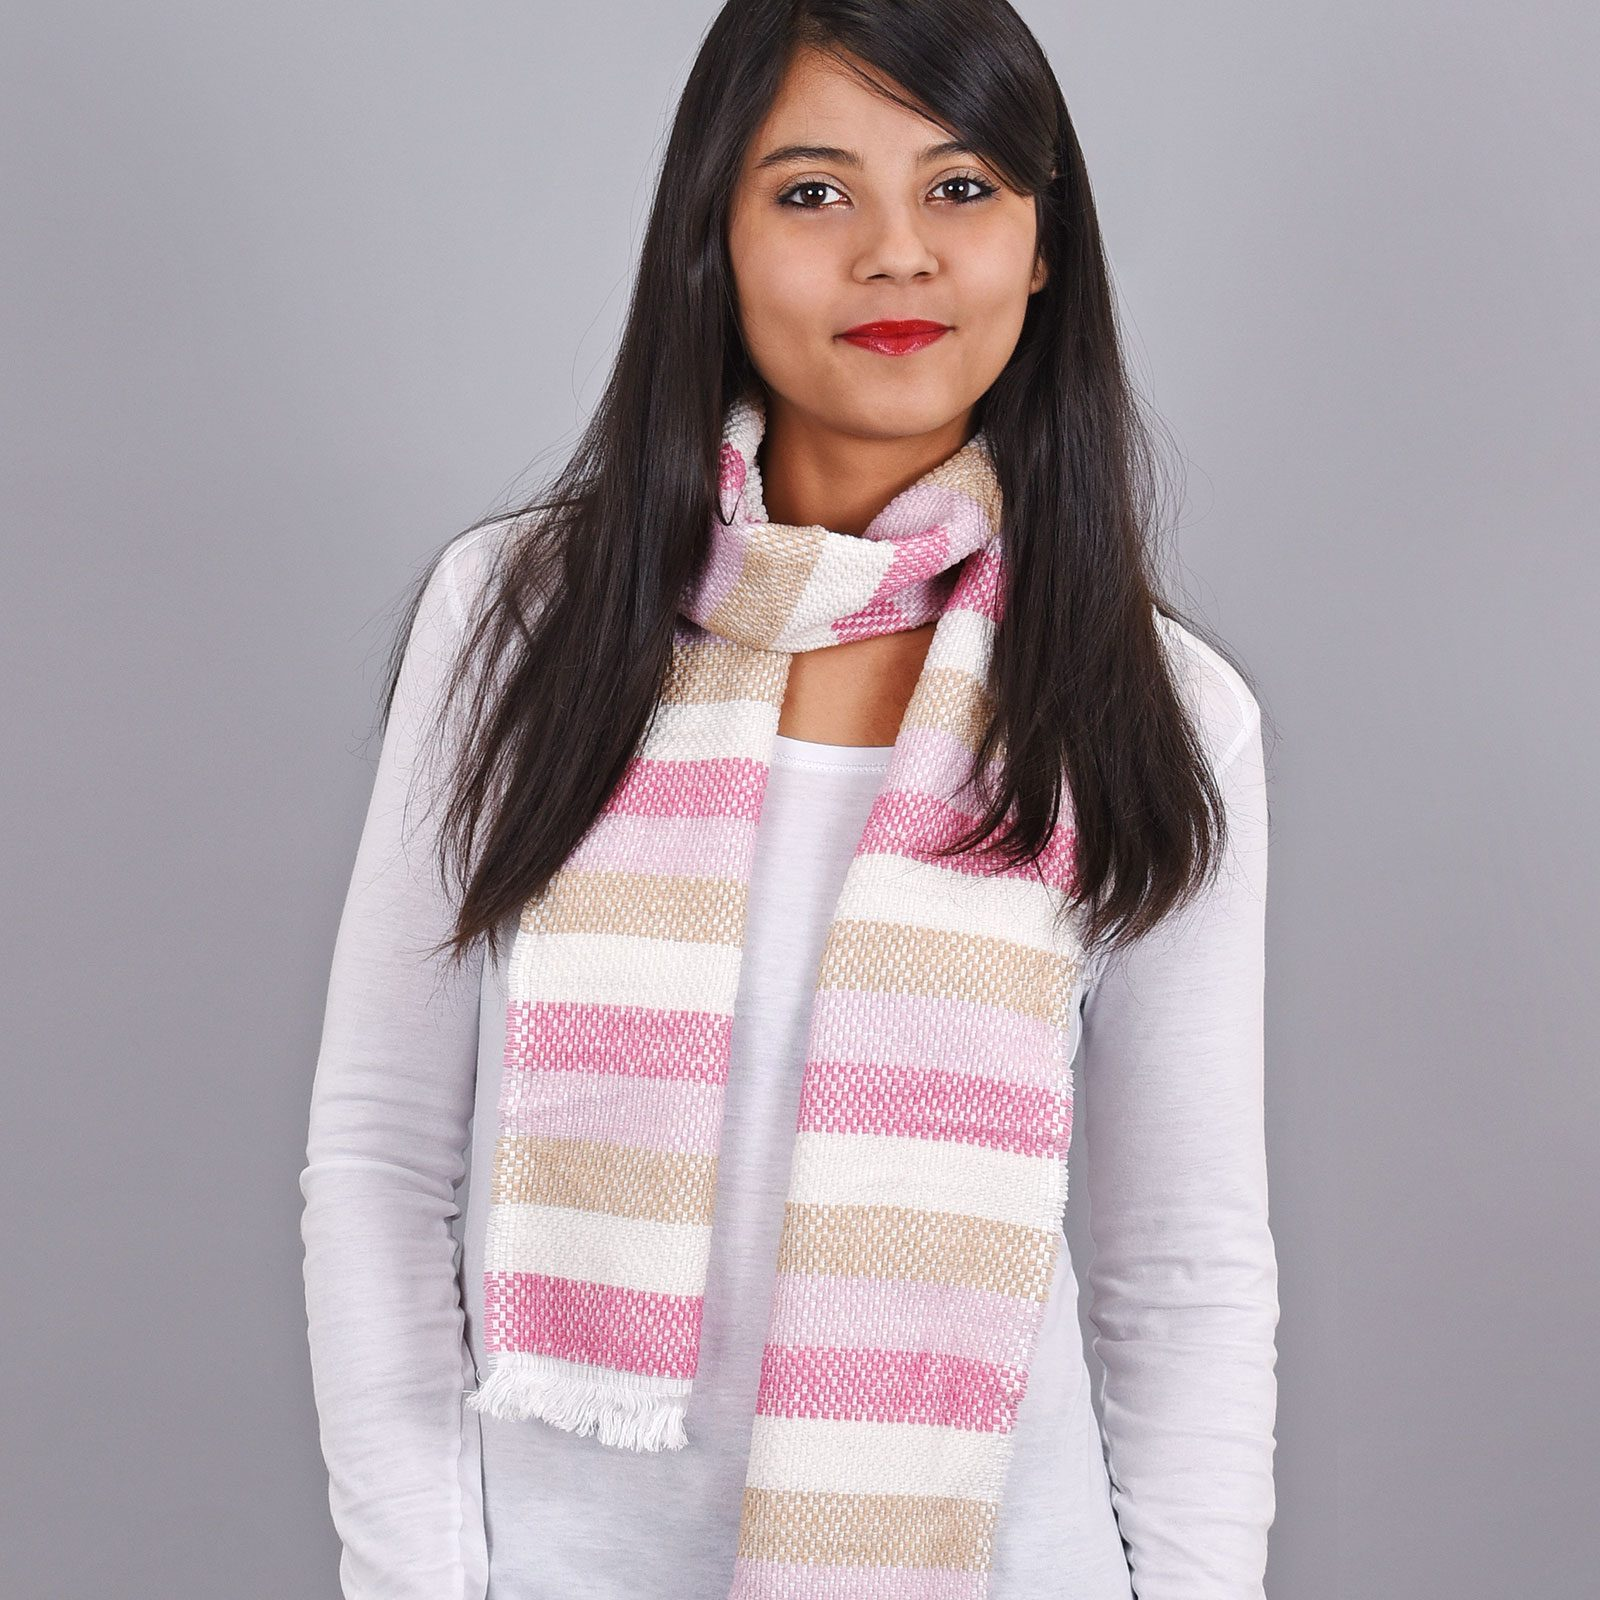 http://lookbook.allee-du-foulard.fr/wp-content/uploads/2019/01/AT-03487-VF16-echarpe-rayures-rose-creme-fabrication-france-1-1600x1600.jpg